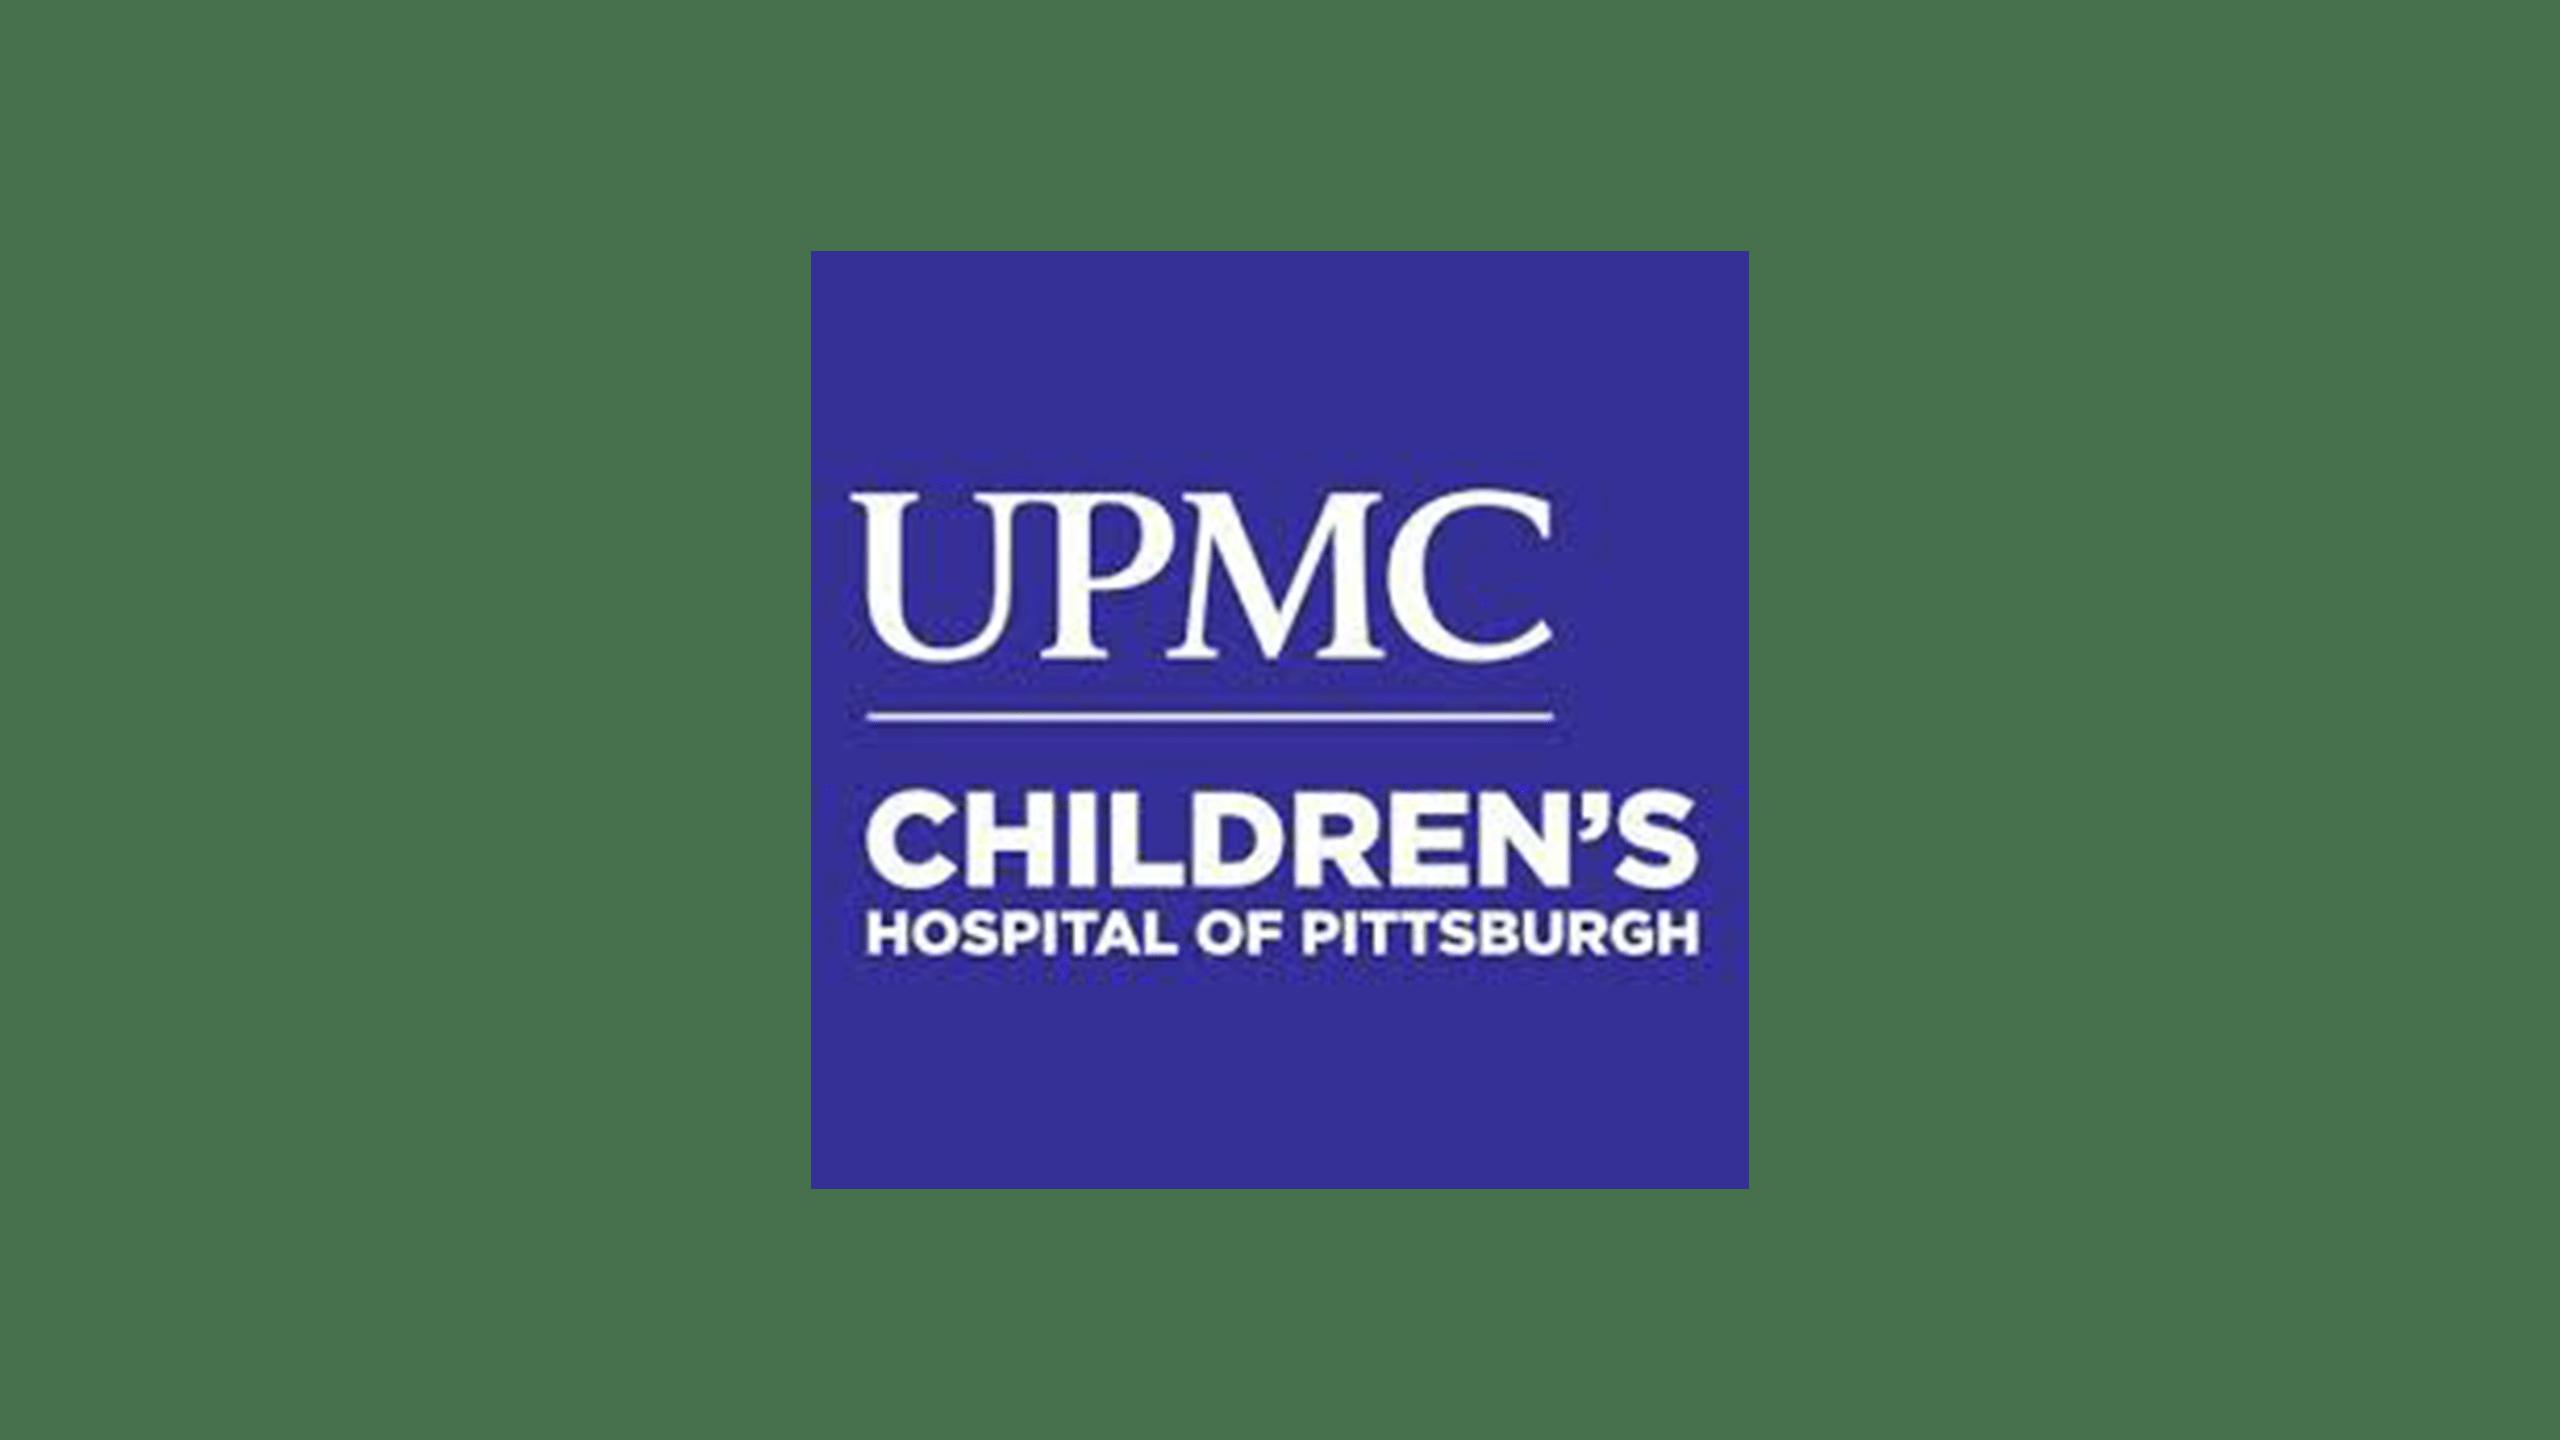 UPMC CHILDREN'S HOSPITAL OF PITTSBURGH